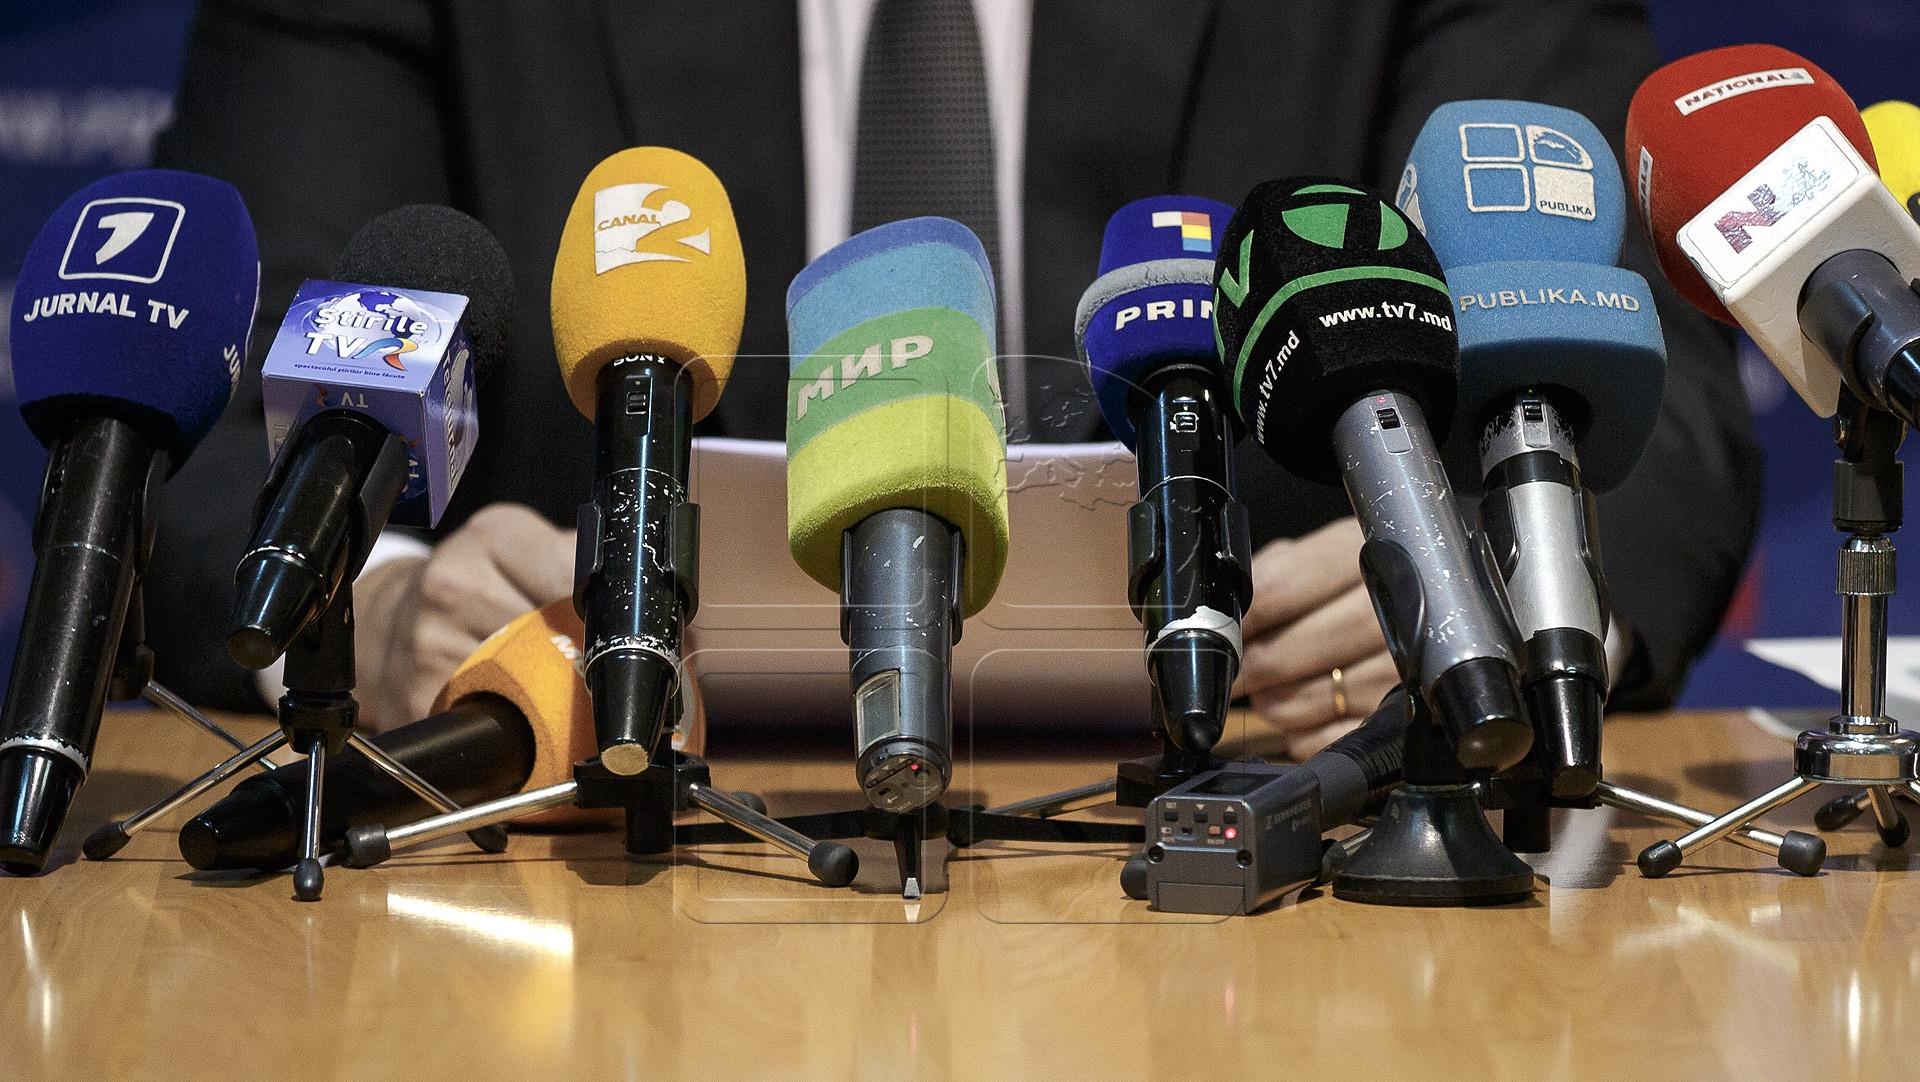 chisianu, sondaj Evoluțiile și Preferințele privind mass-media din Republica Moldova